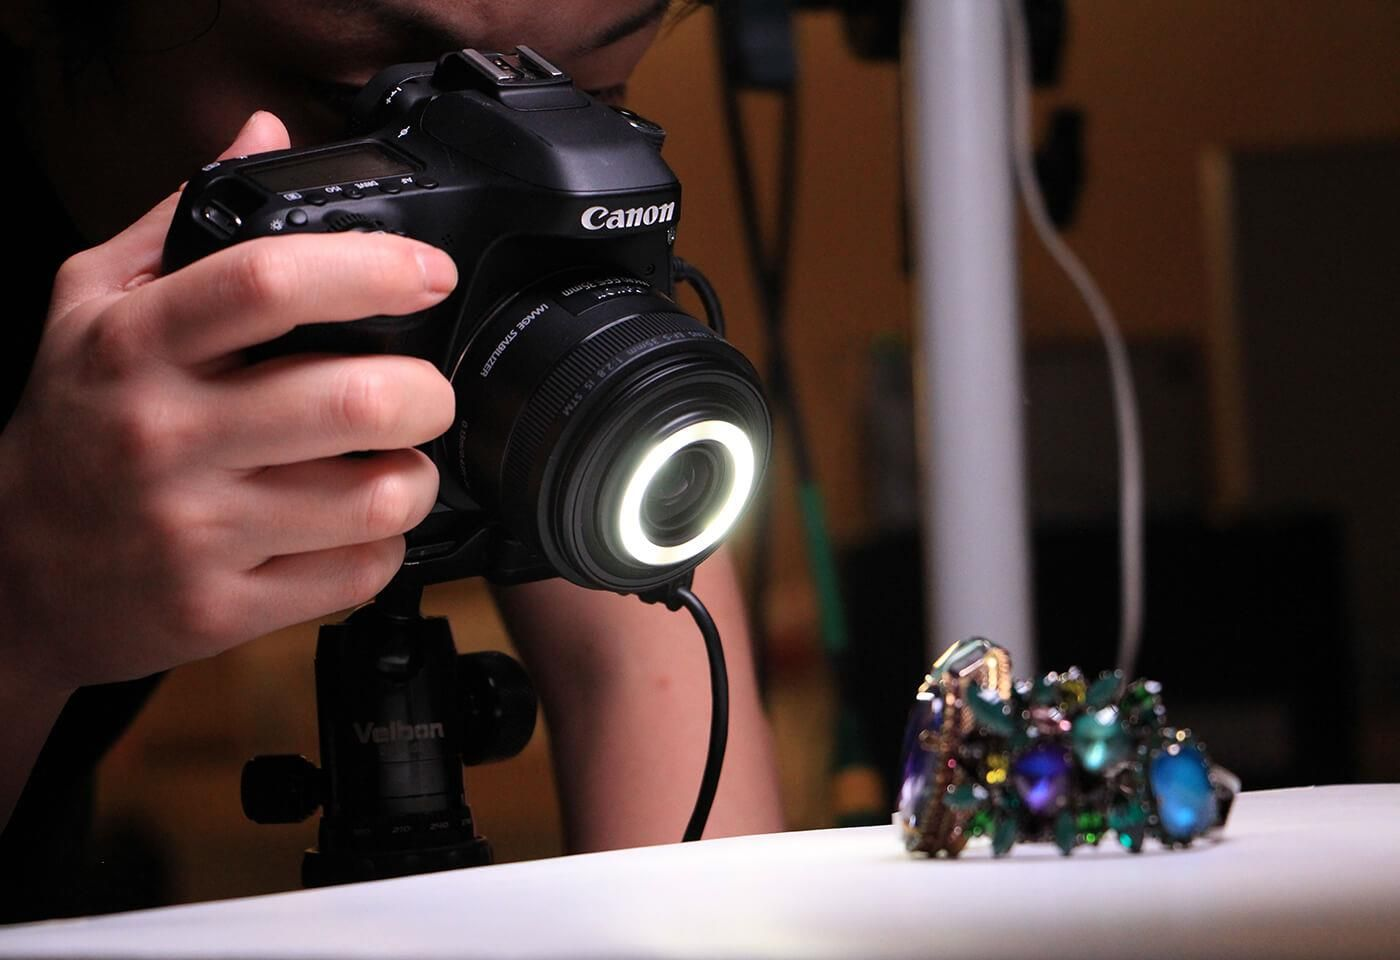 Ef S 35mm F 2 8 Macro Is Stm Lens Https Www Camerasdirect Com Au Canon Ef S 35mm F 2 8 Macro Is Stm Lens Lente Canon Cameras Dslr Iluminacao Embutida